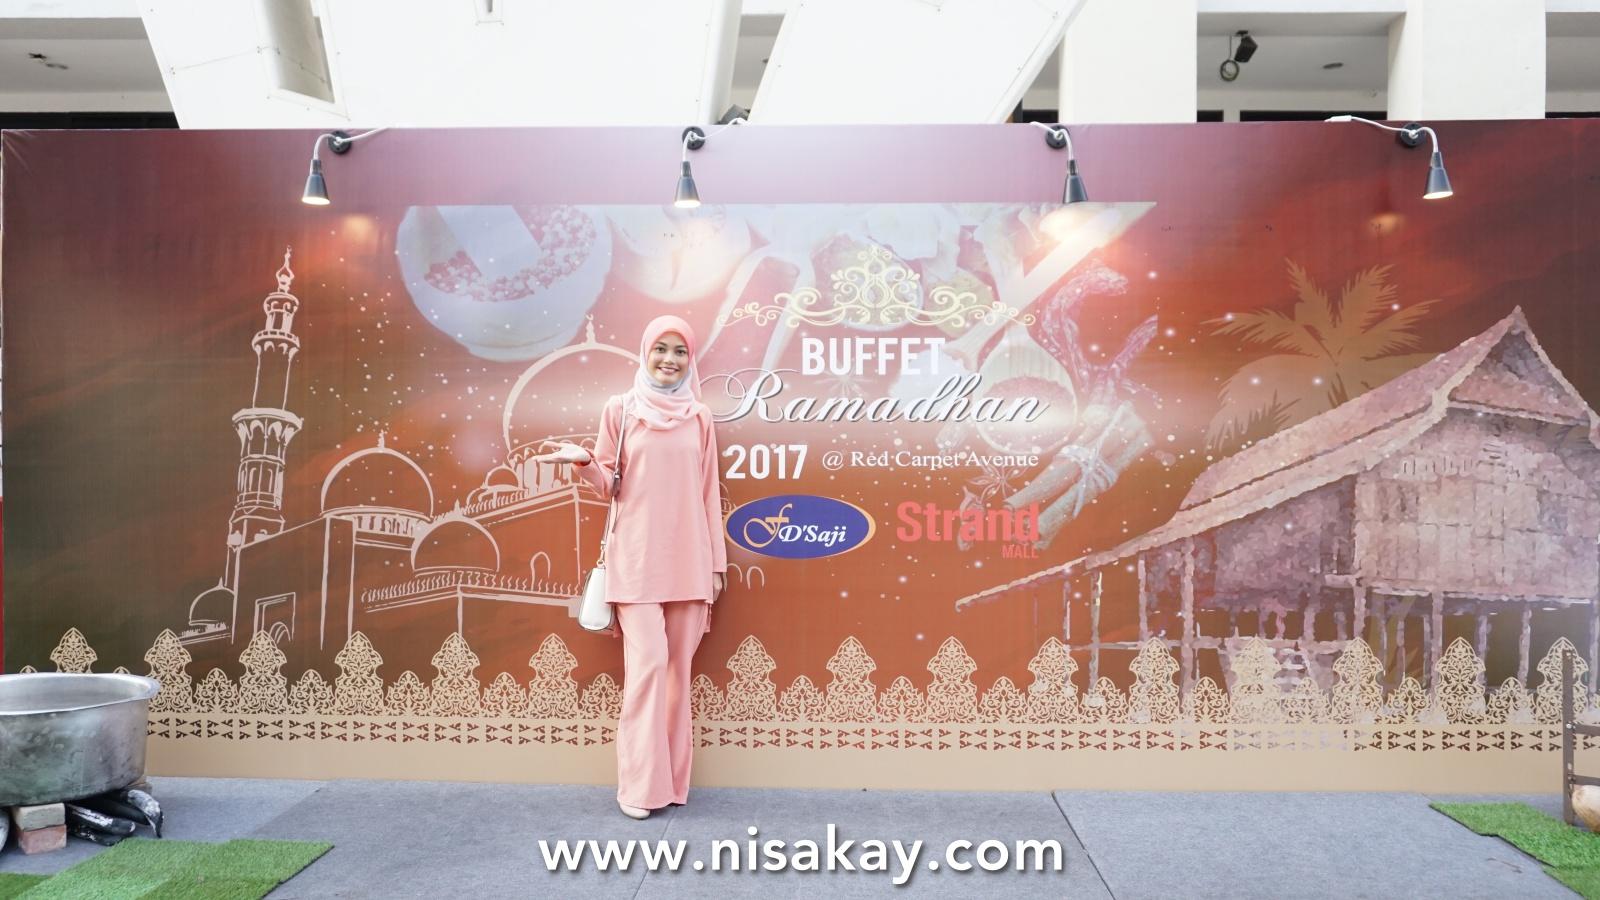 Ramadhan Archives Media Panas Tcash Vaganza 17 Kk New Motif 2016 Buffet Murah Felda Dsaji Di Red Carpet Avenue The Strand Kota Damansara